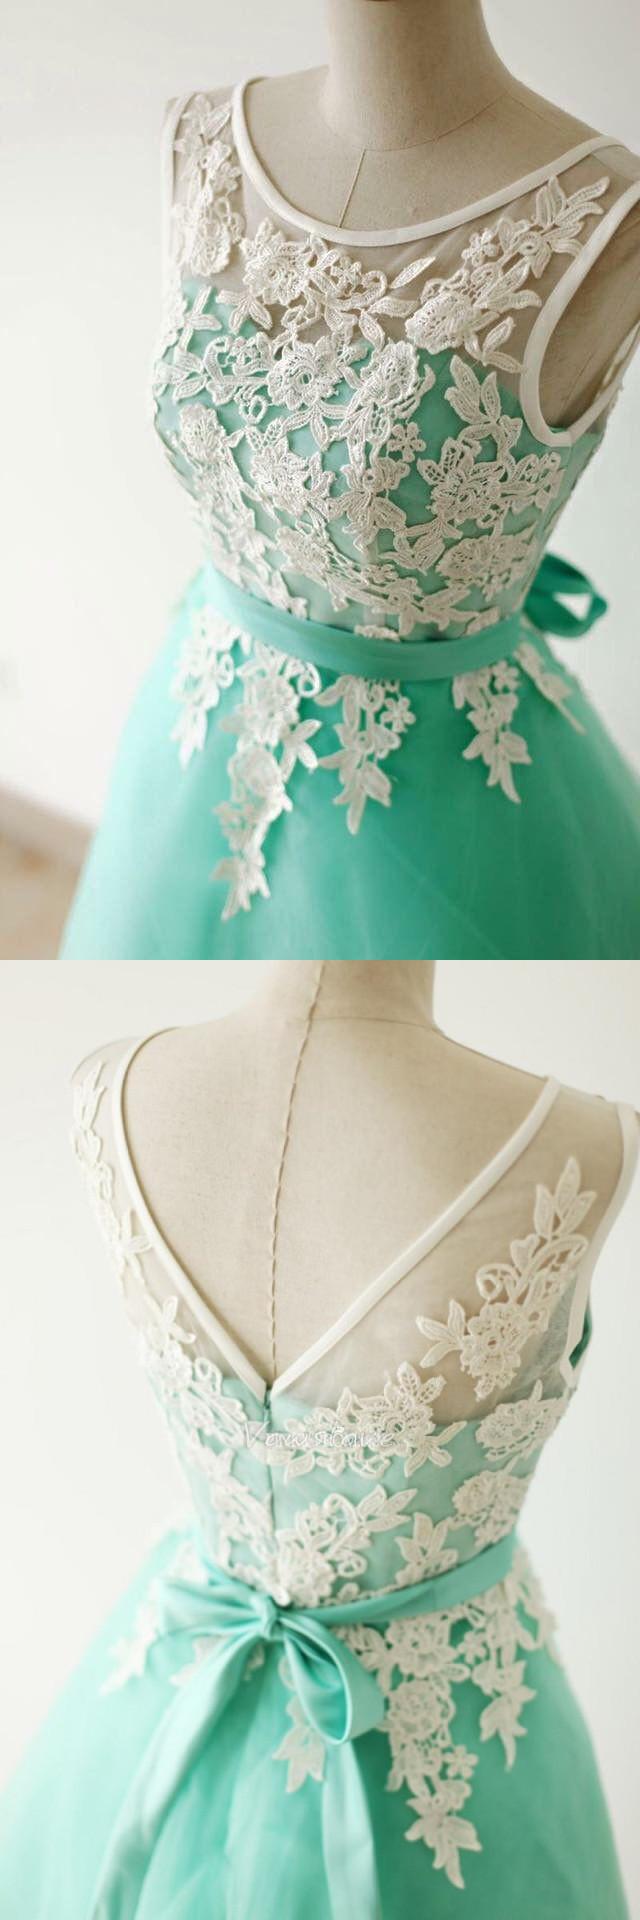 homecoming dress bridesmaid dress mint green short